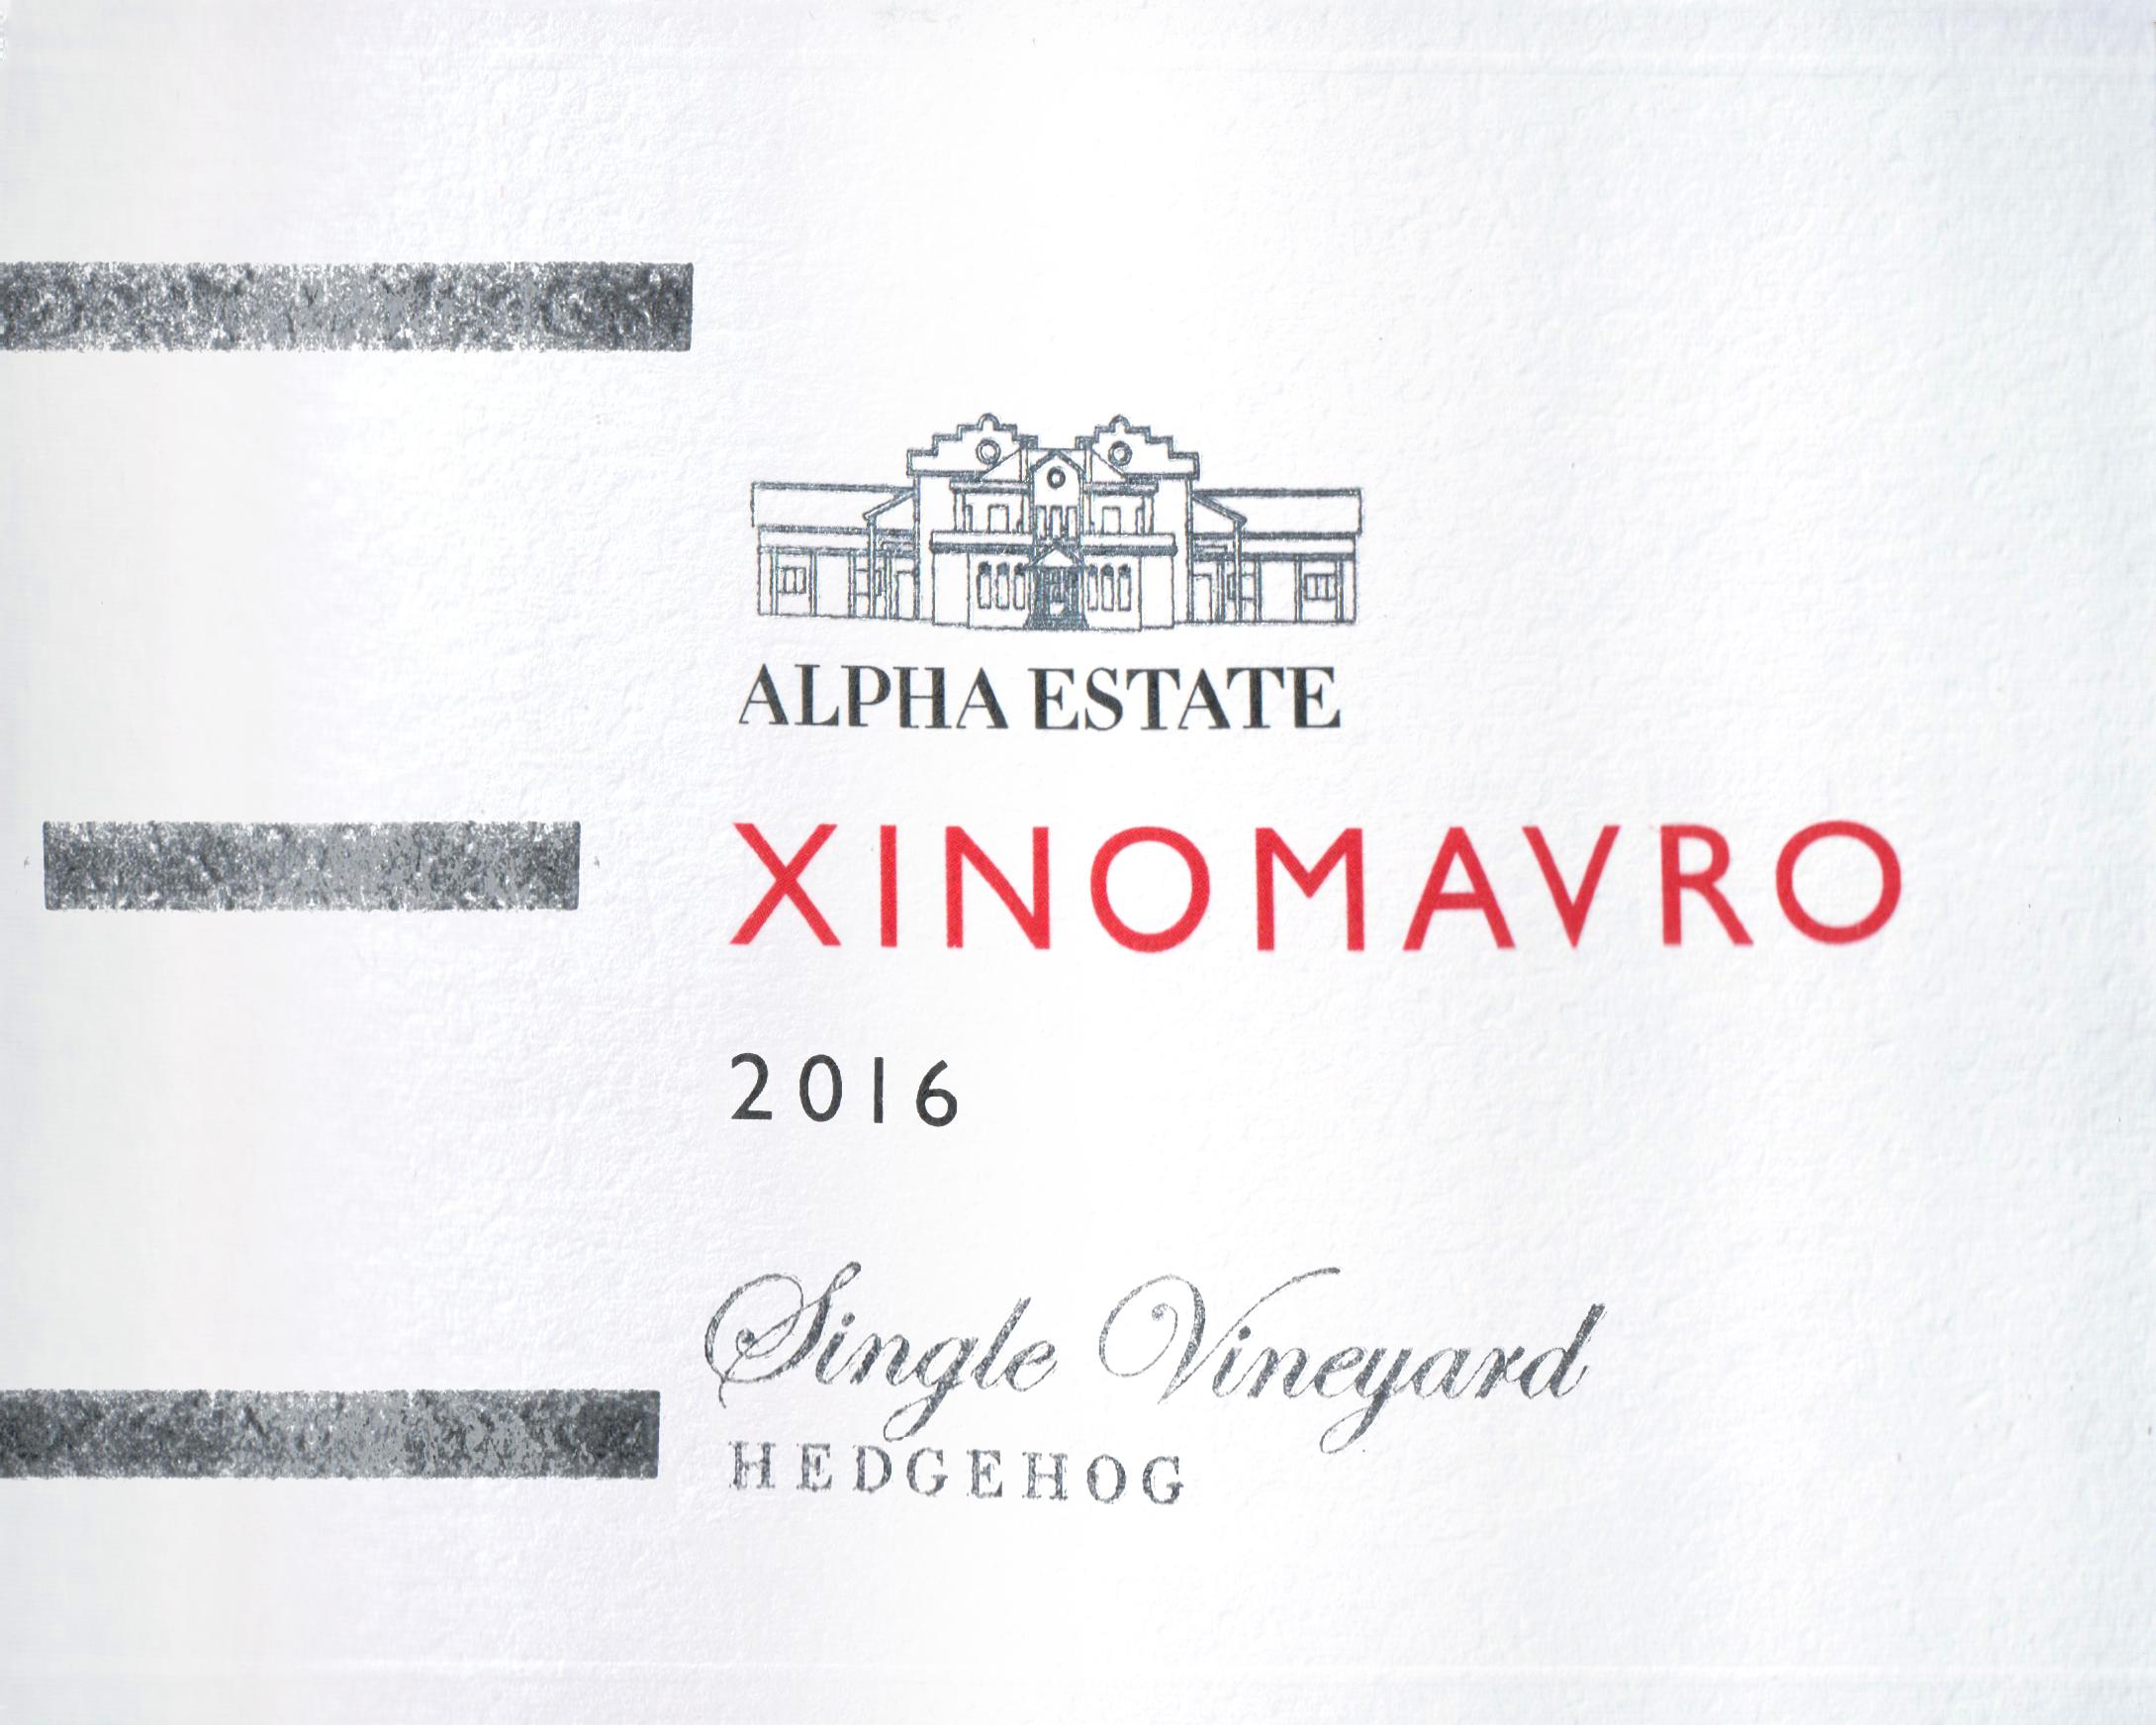 Alpha Estate Hedgehog Xinomavro 2016